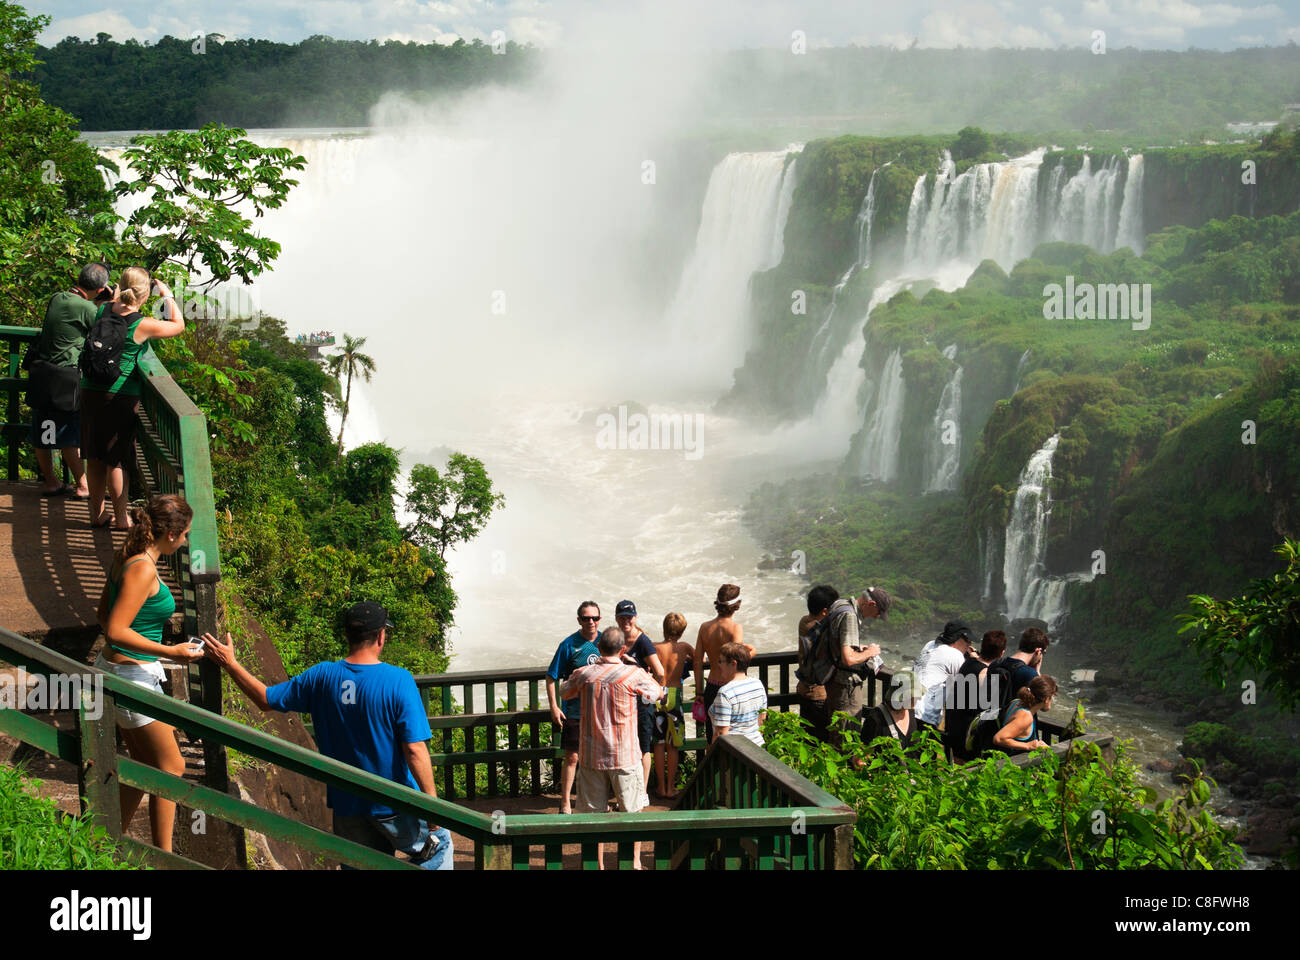 Tourist look at Iguazu, Iguaçu Falls, from platform, Cataratas do Iguaçu, Cataratas del Iguazú. Curitiba, - Stock Image